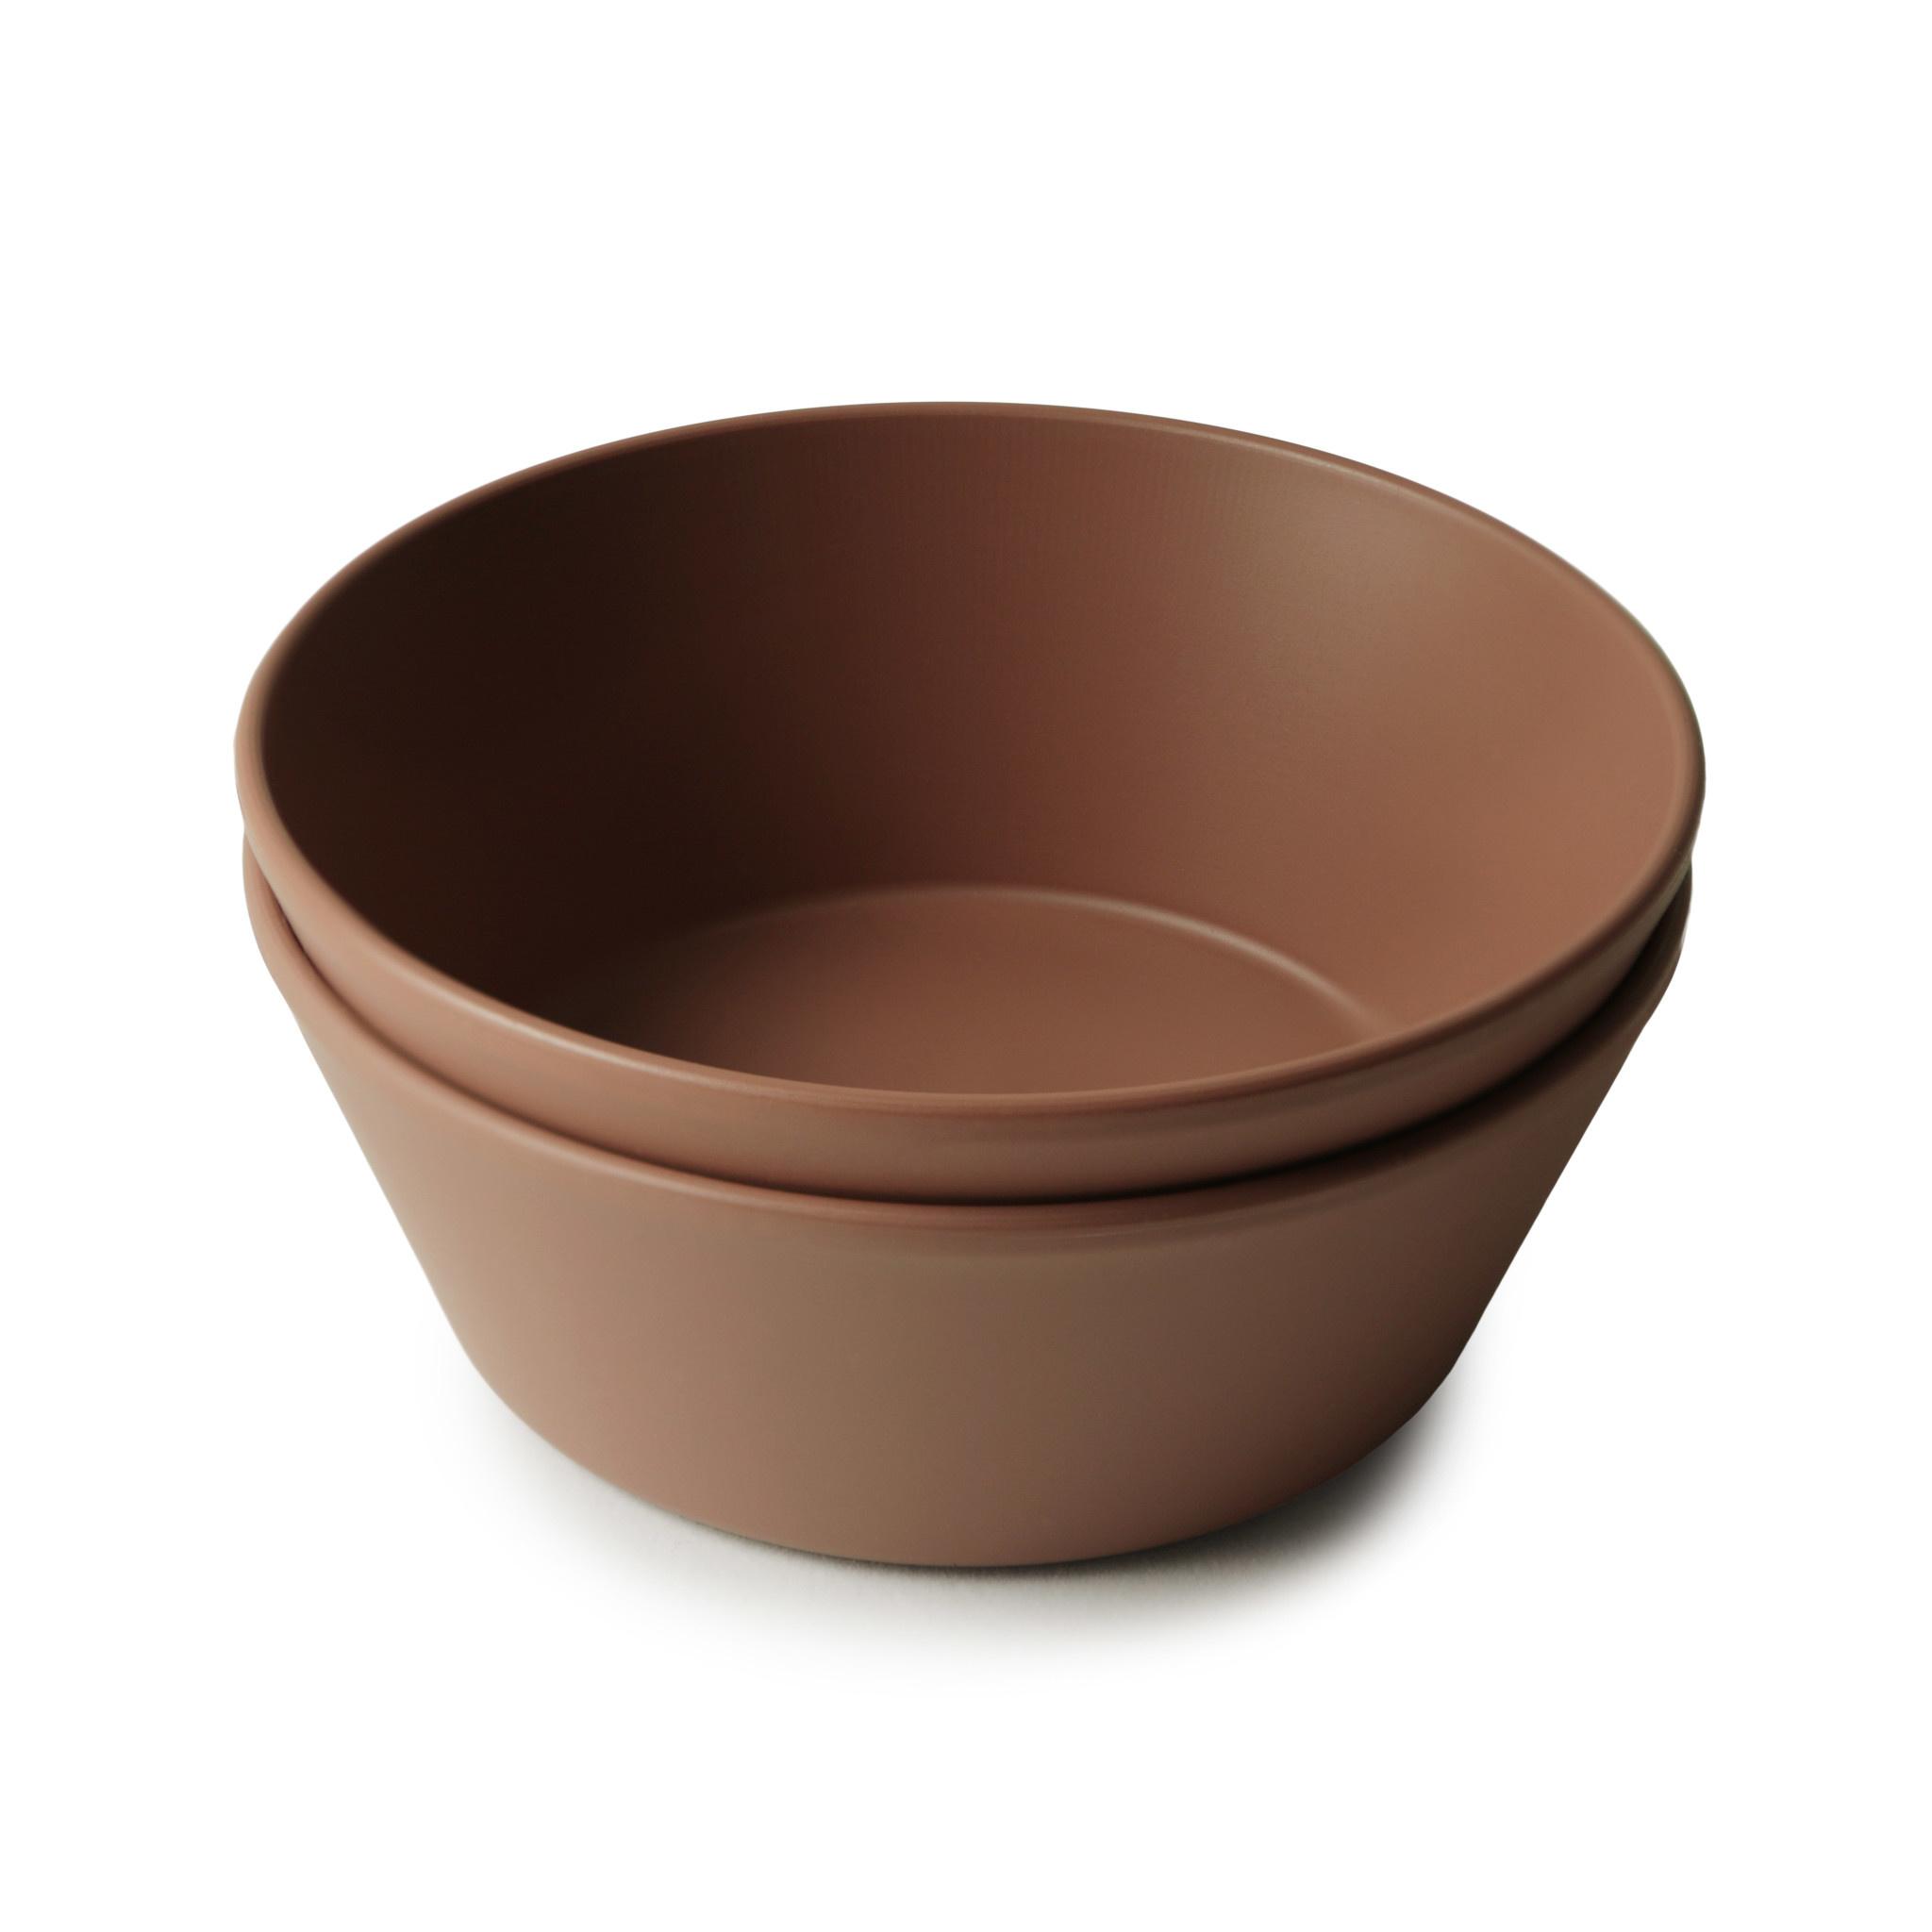 Bowls round 2 pack caramel-1